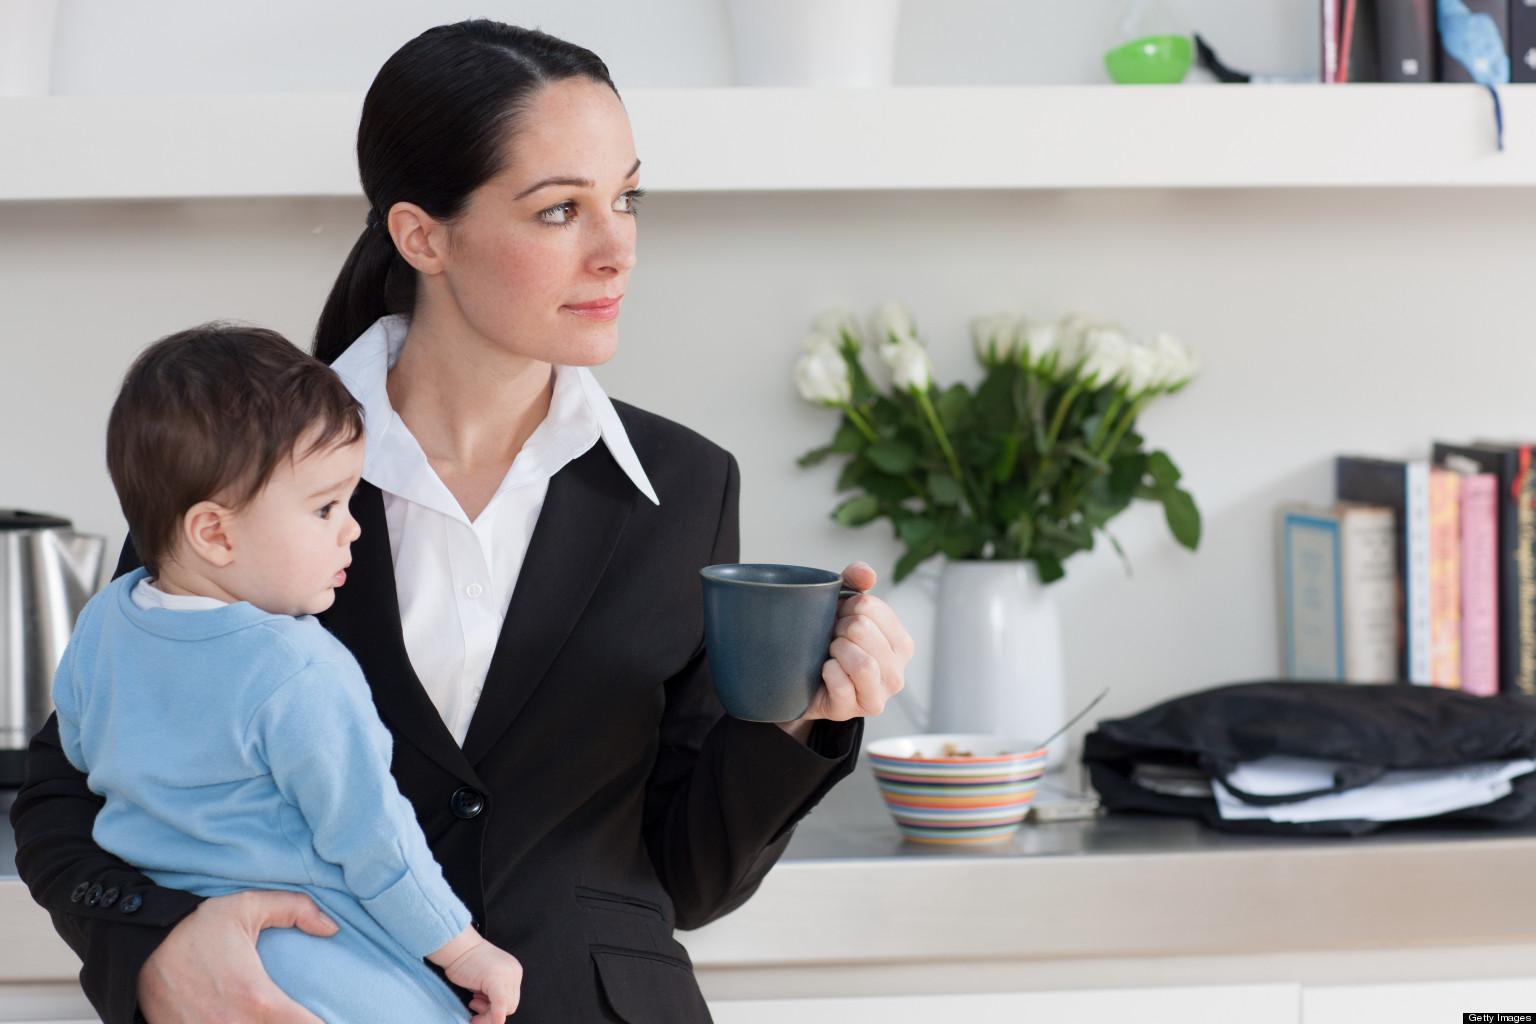 madre trabajadora